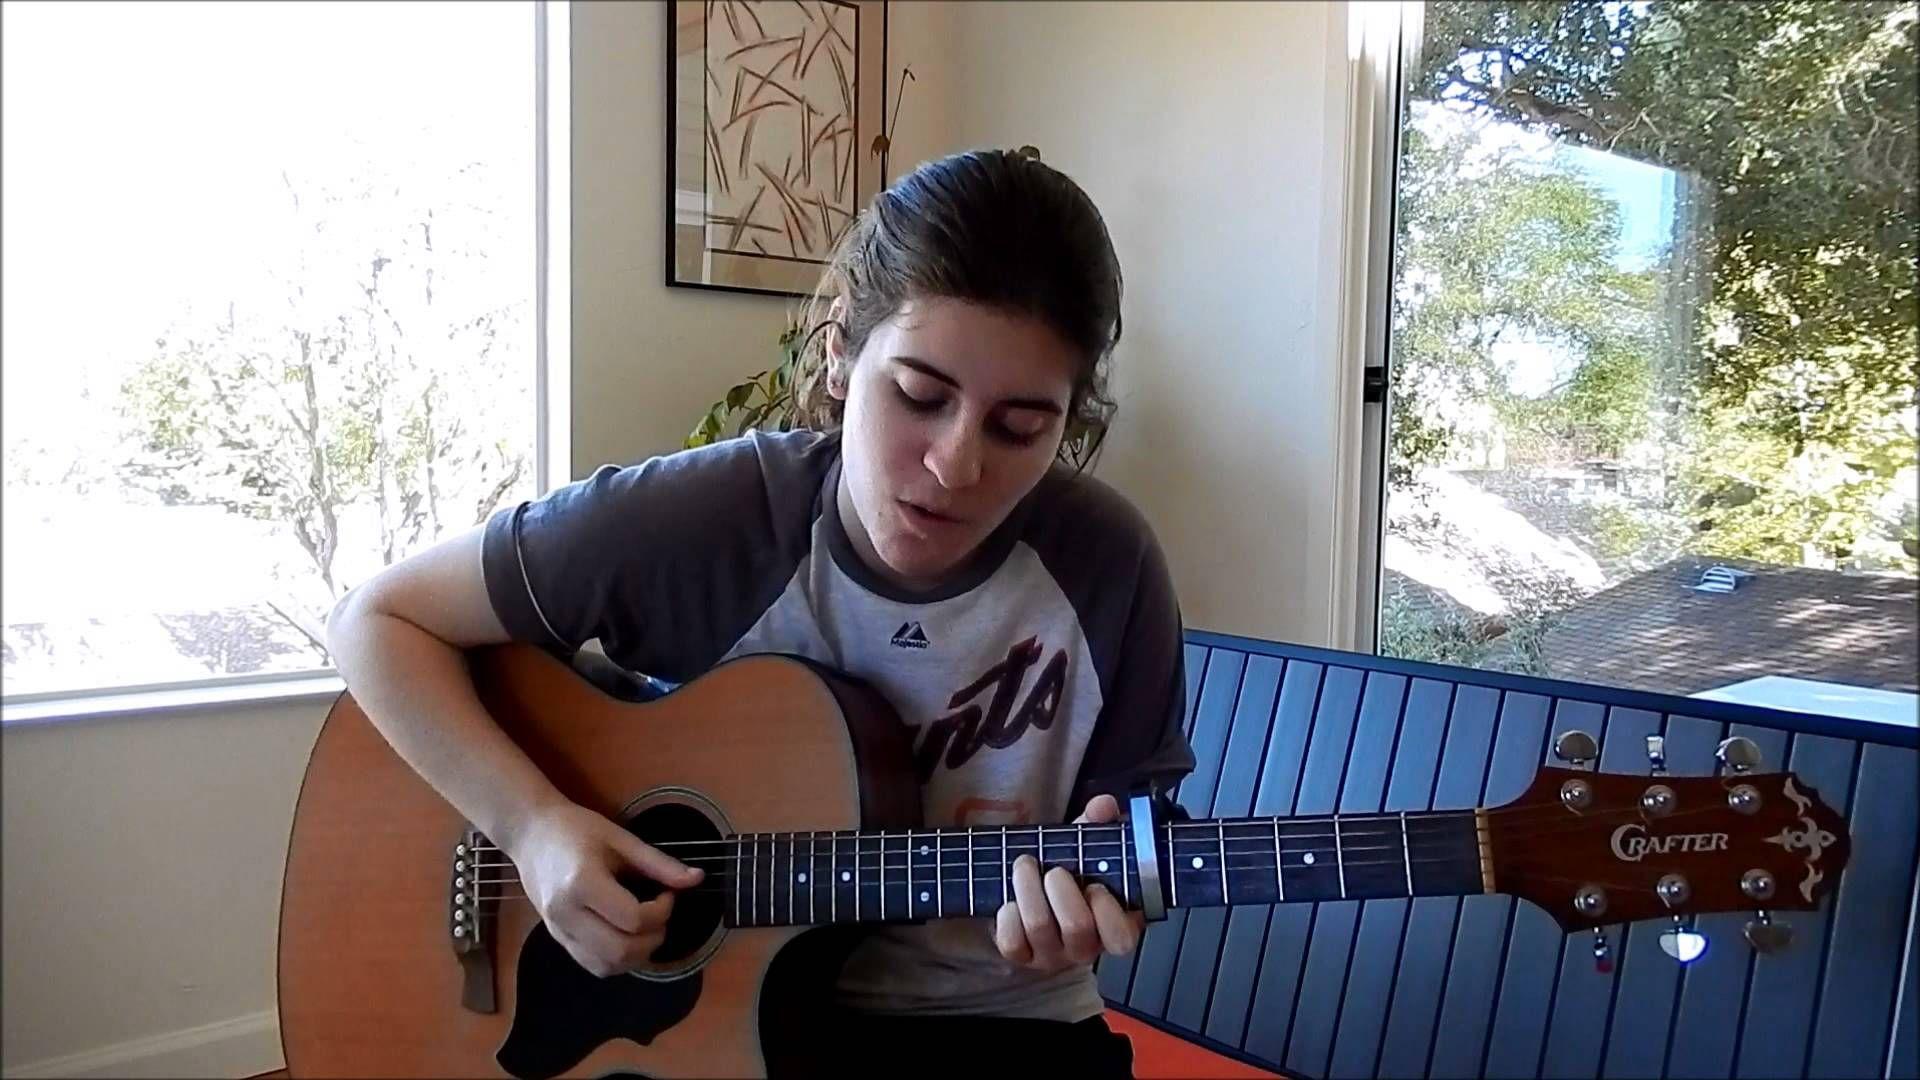 Eyelashes Tori Kelly Guitar Tutorial Everything Tori Kelly